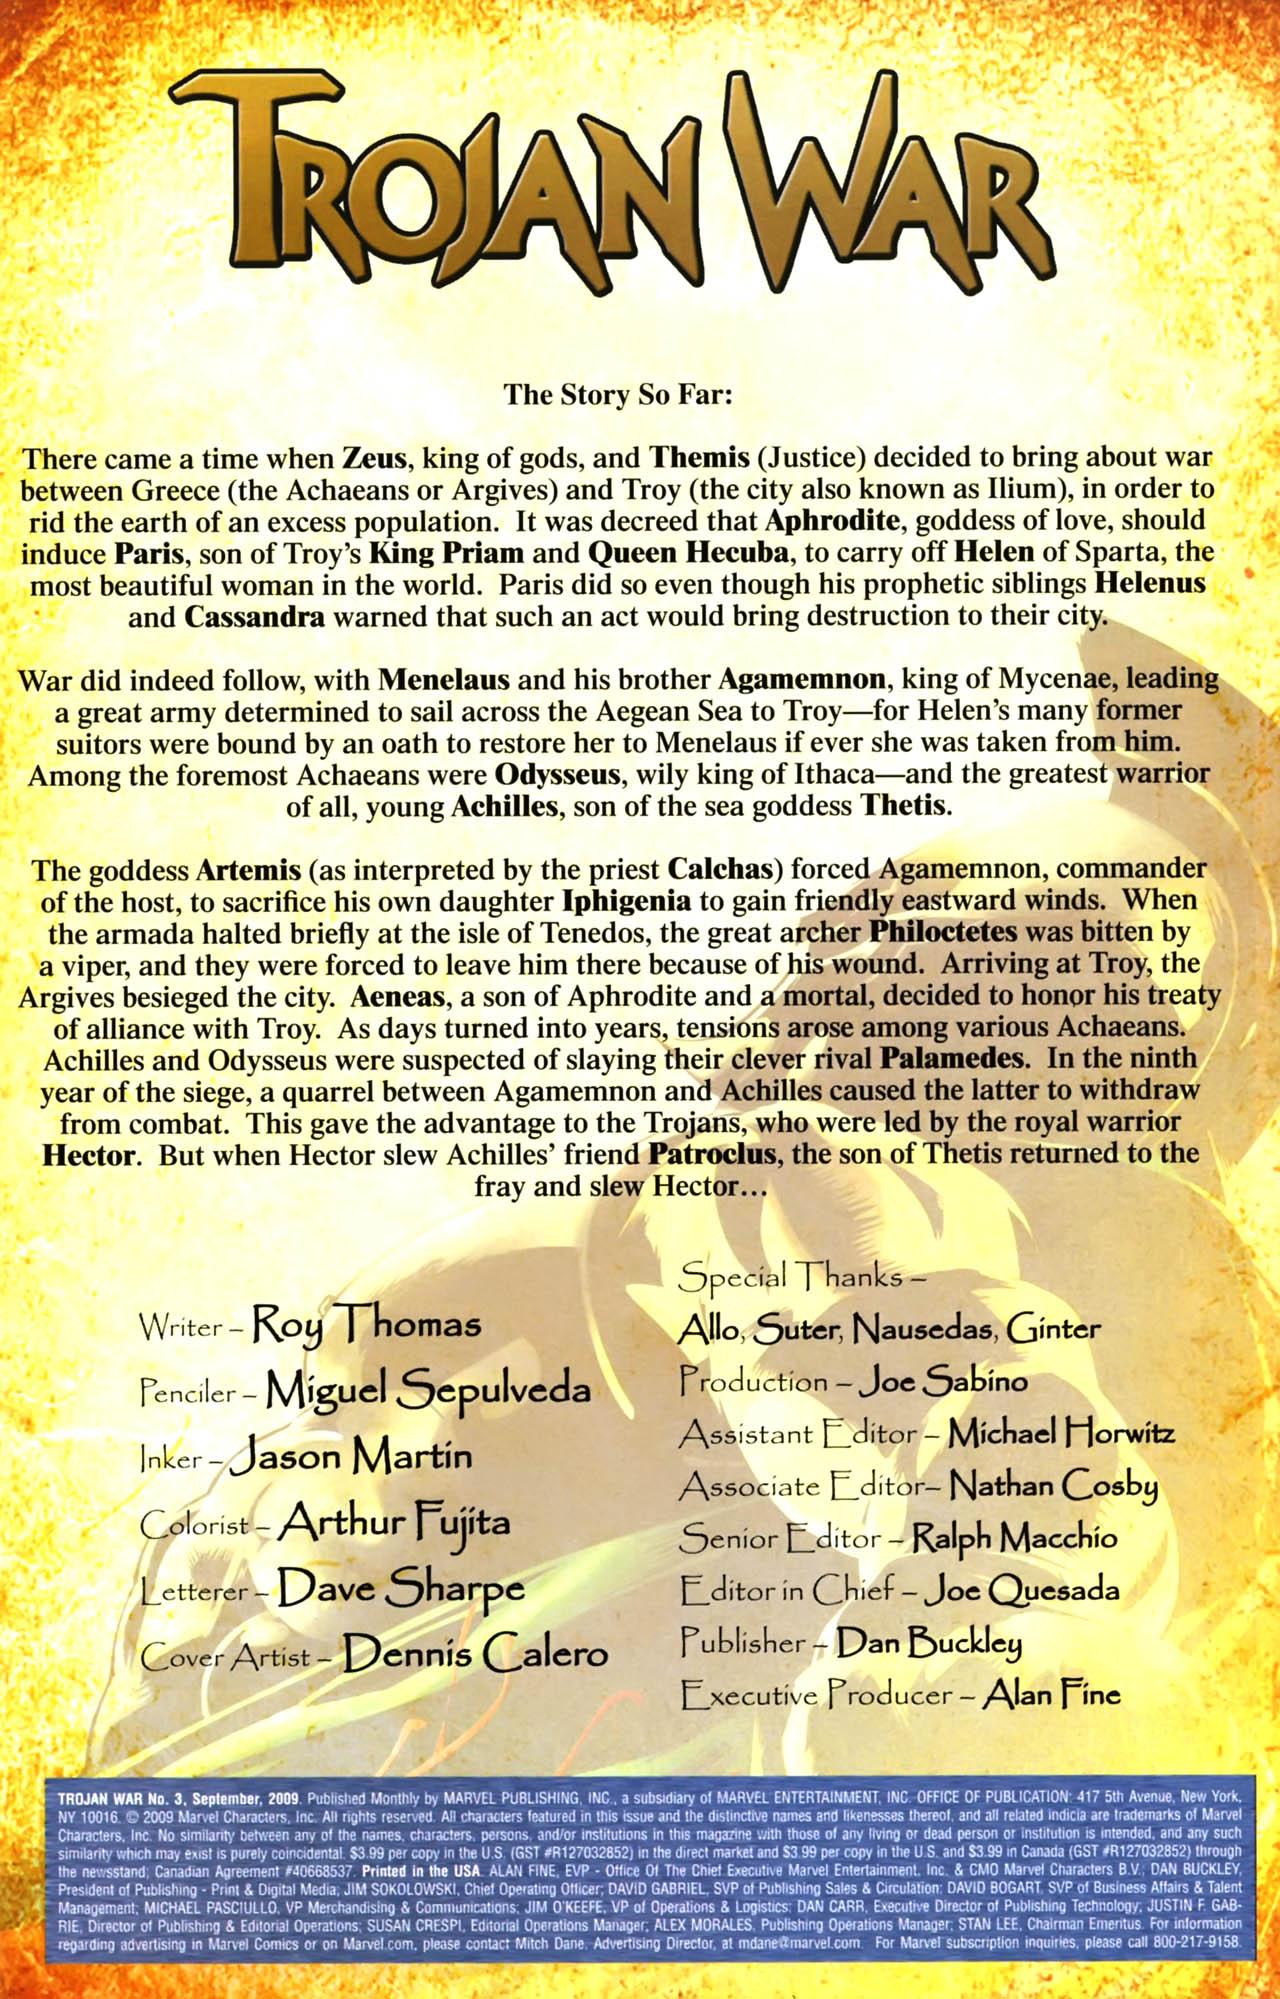 Read online Trojan War comic -  Issue #3 - 2